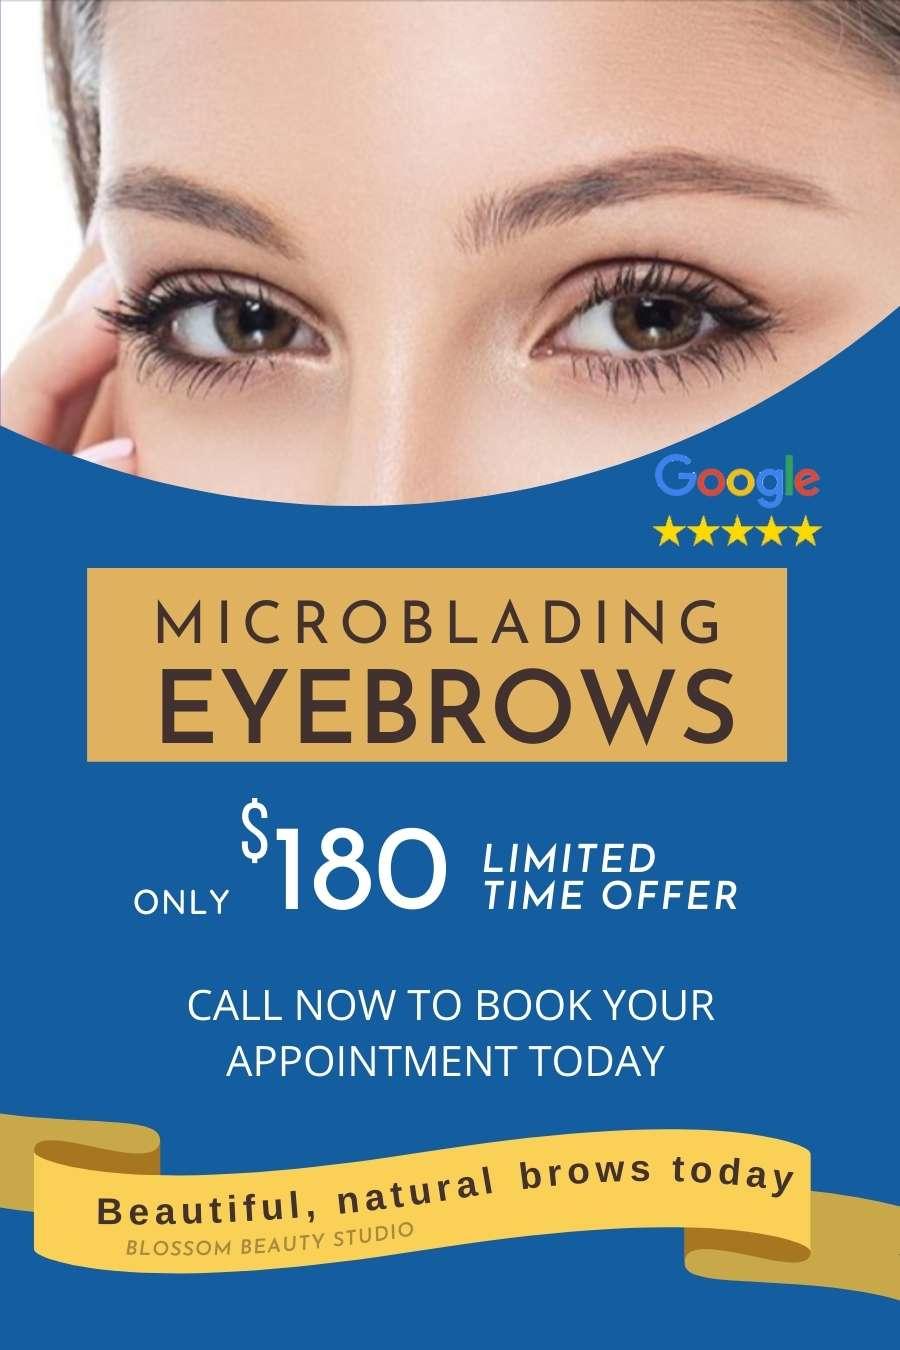 Eyebrow Microblading deals in Rancho Cucamonga